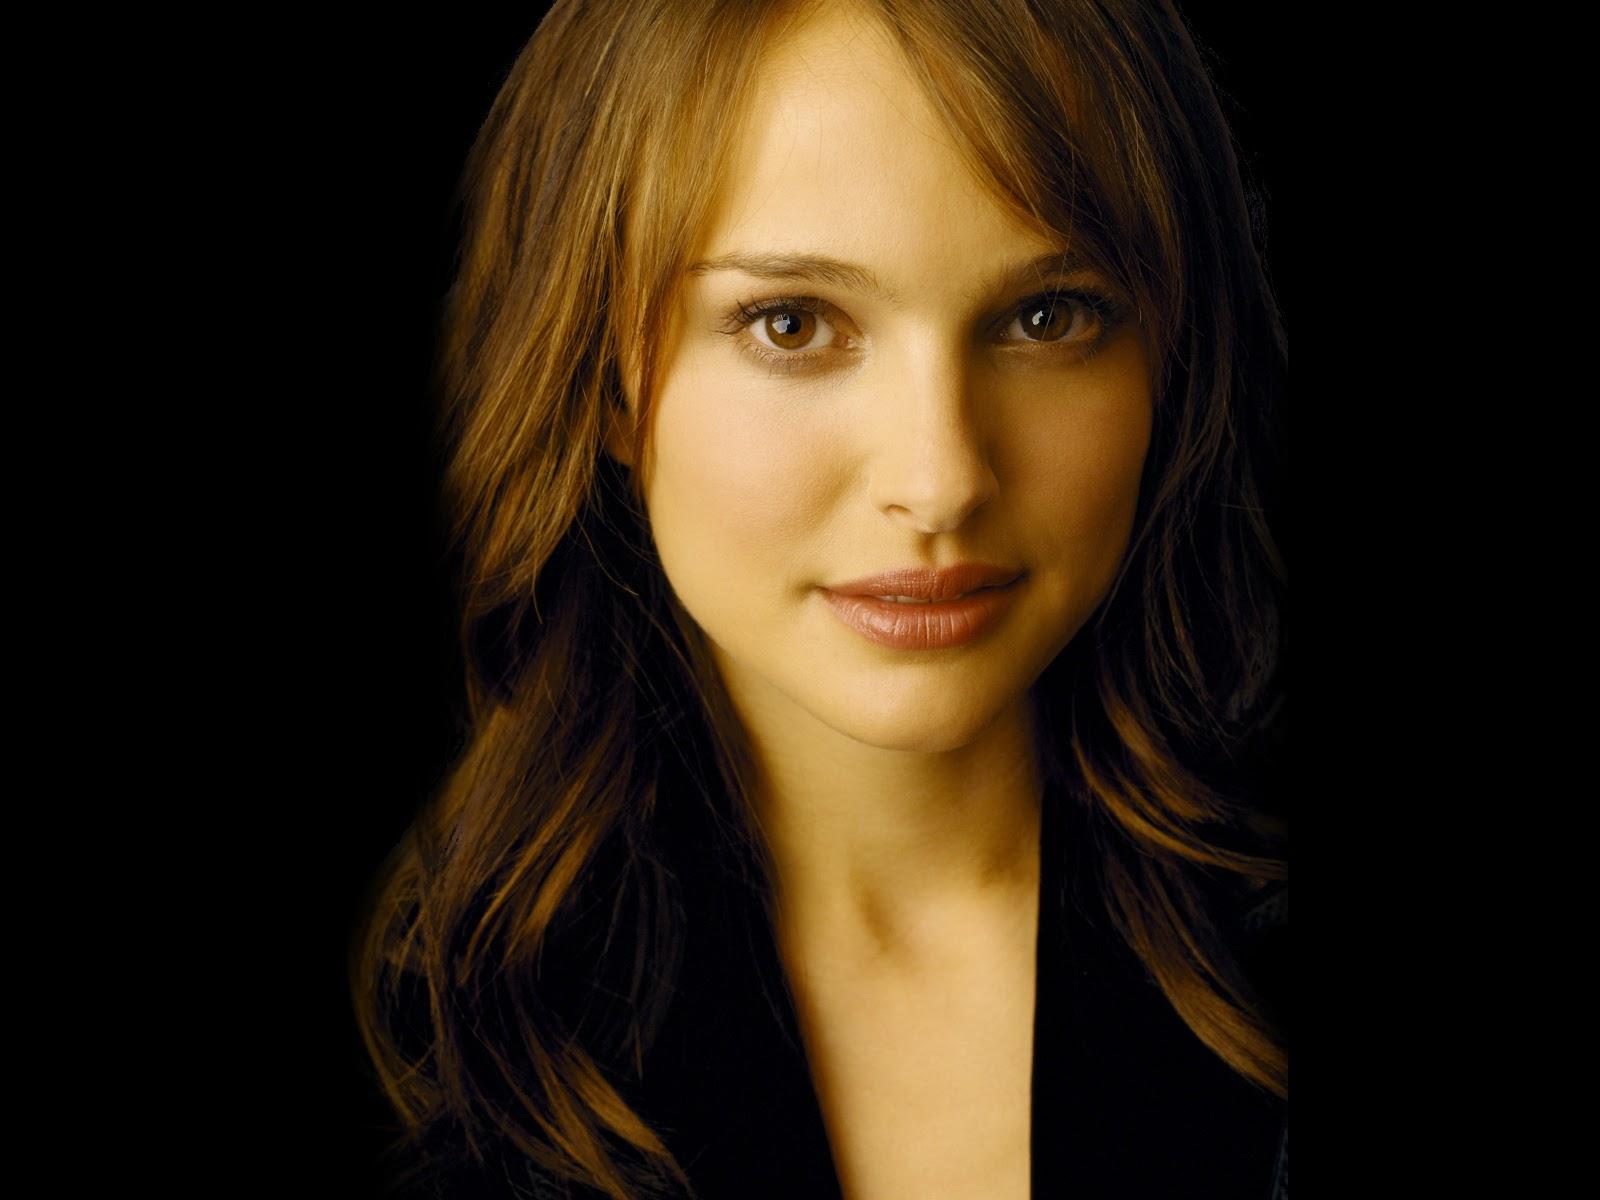 HD WALLPAPERS FREE DOWNLOAD: Hollywood Actress Hot HD ...